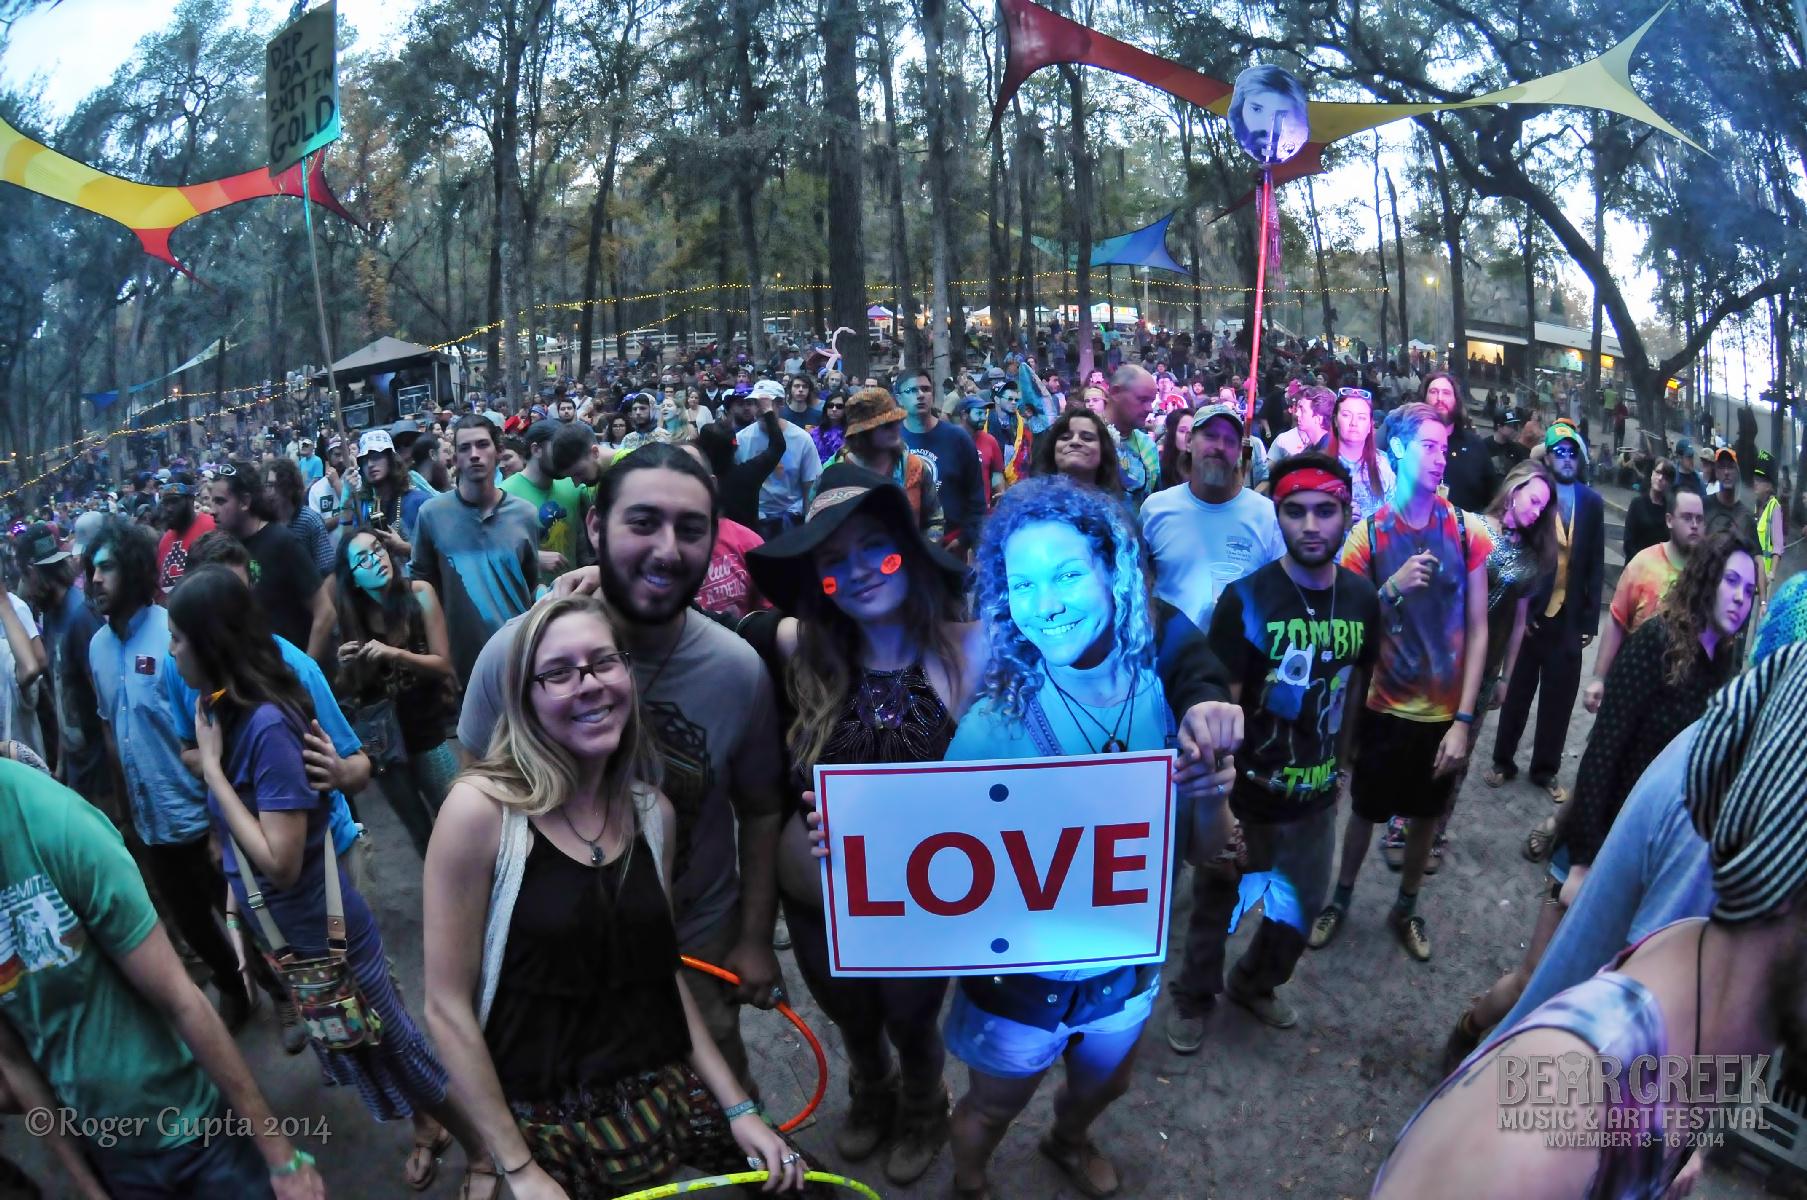 Bear Creek Music Festival Nov. 13-16 Review